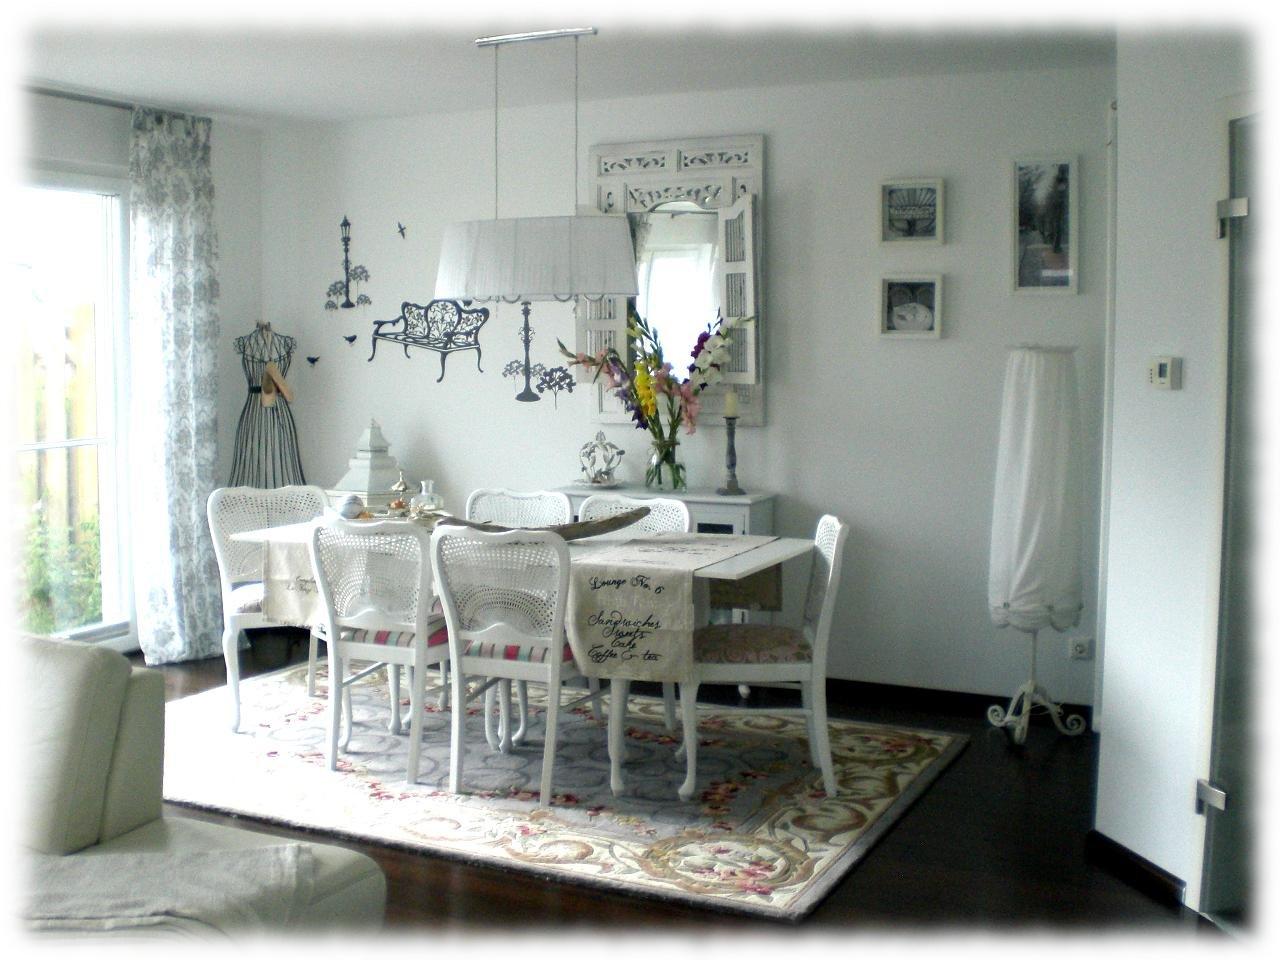 Wohnzimmer 39 les salons parisiens 39 villa charme zimmerschau for Les salons parisiens